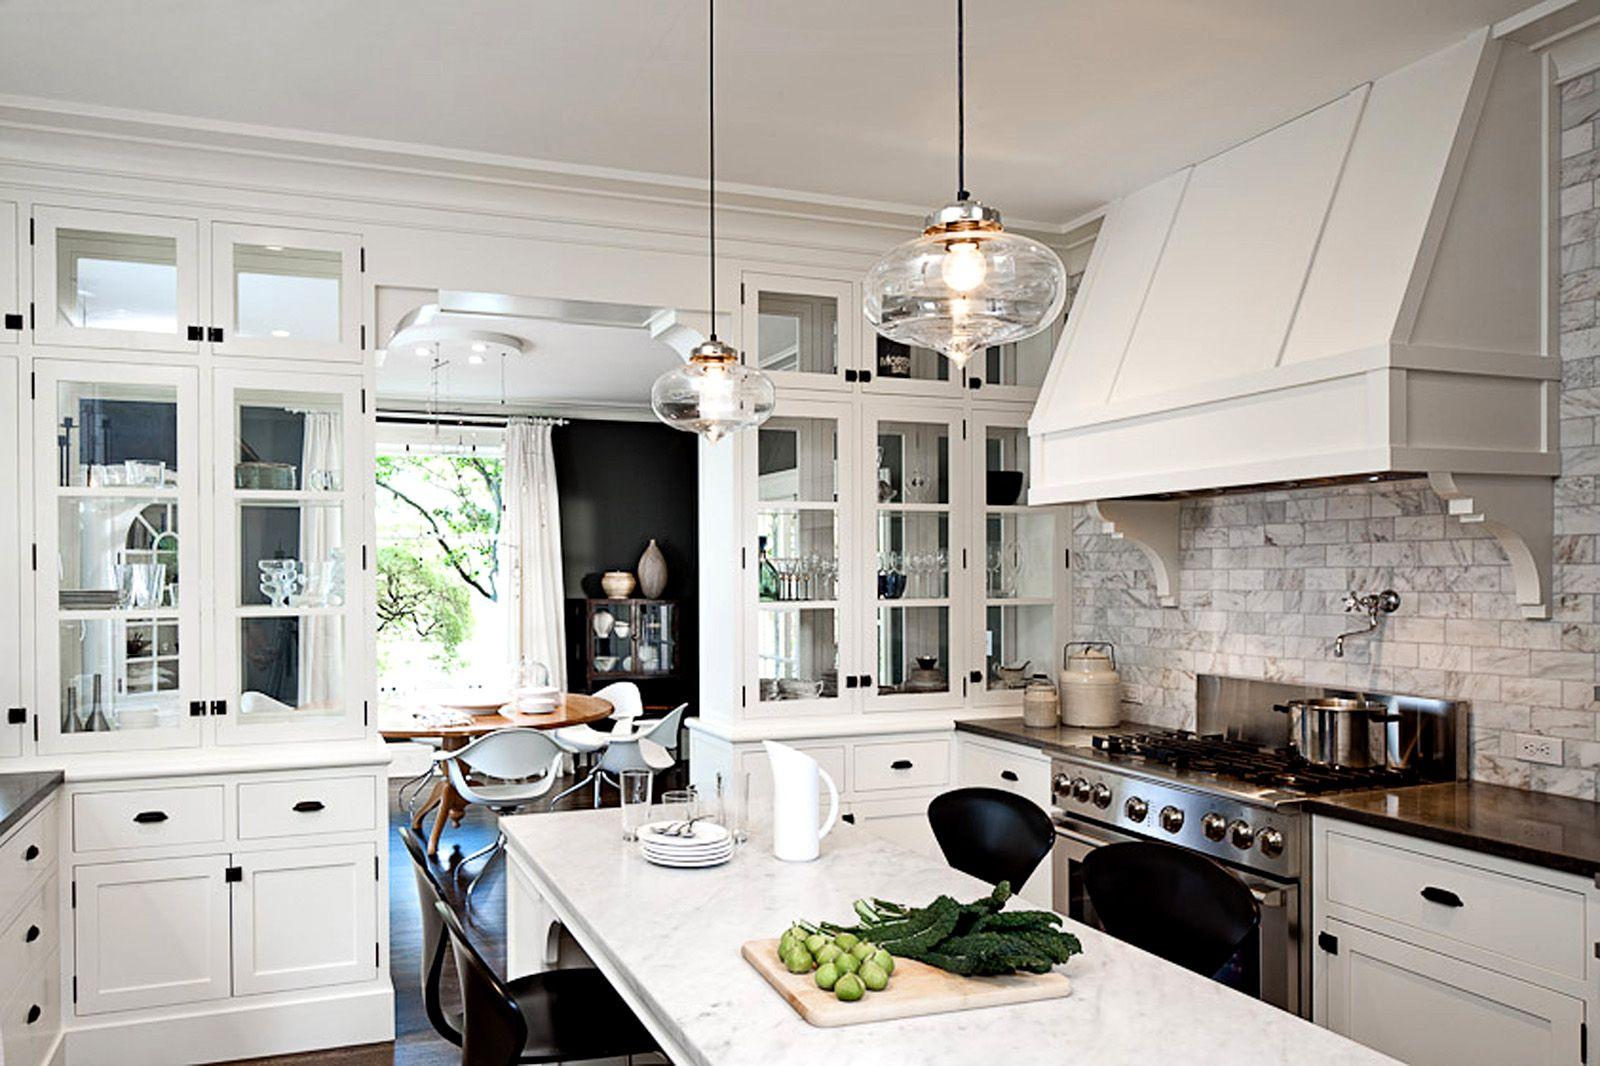 Back Splash Love It Double Sided Glass Cabinets Kitchen Inspirations Kitchen Design Kitchen Remodel